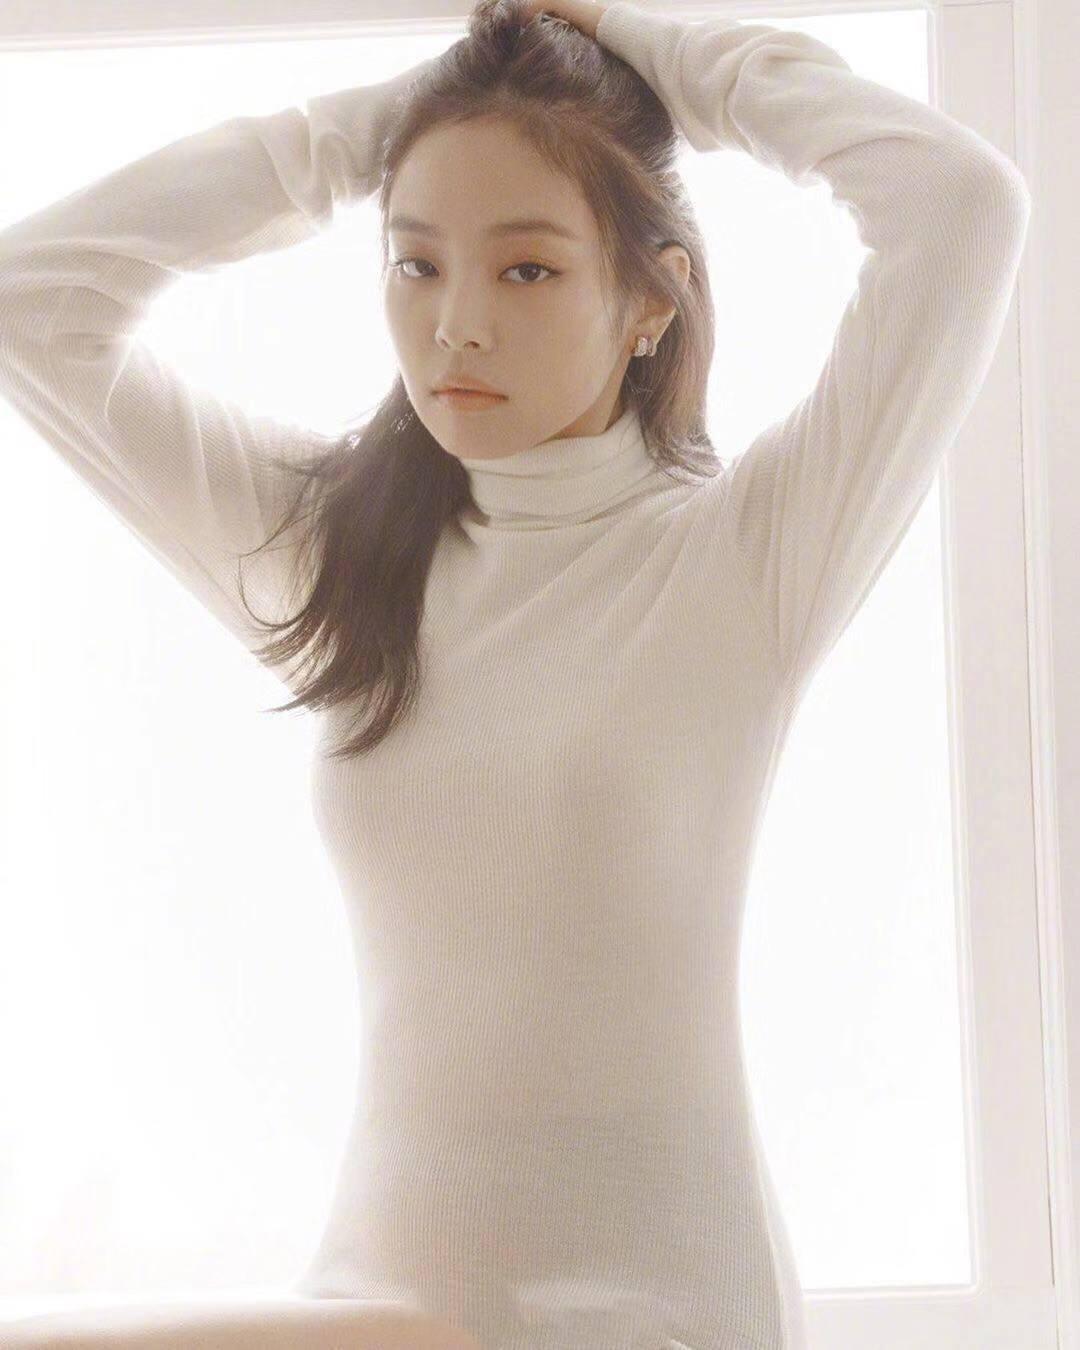 Kpop Blackpink Jennie Same White Sweet Turtleneck Knitted Sweater Women Streetwear Fashion Slim Long Sleeve Sweaters Ladies Tops